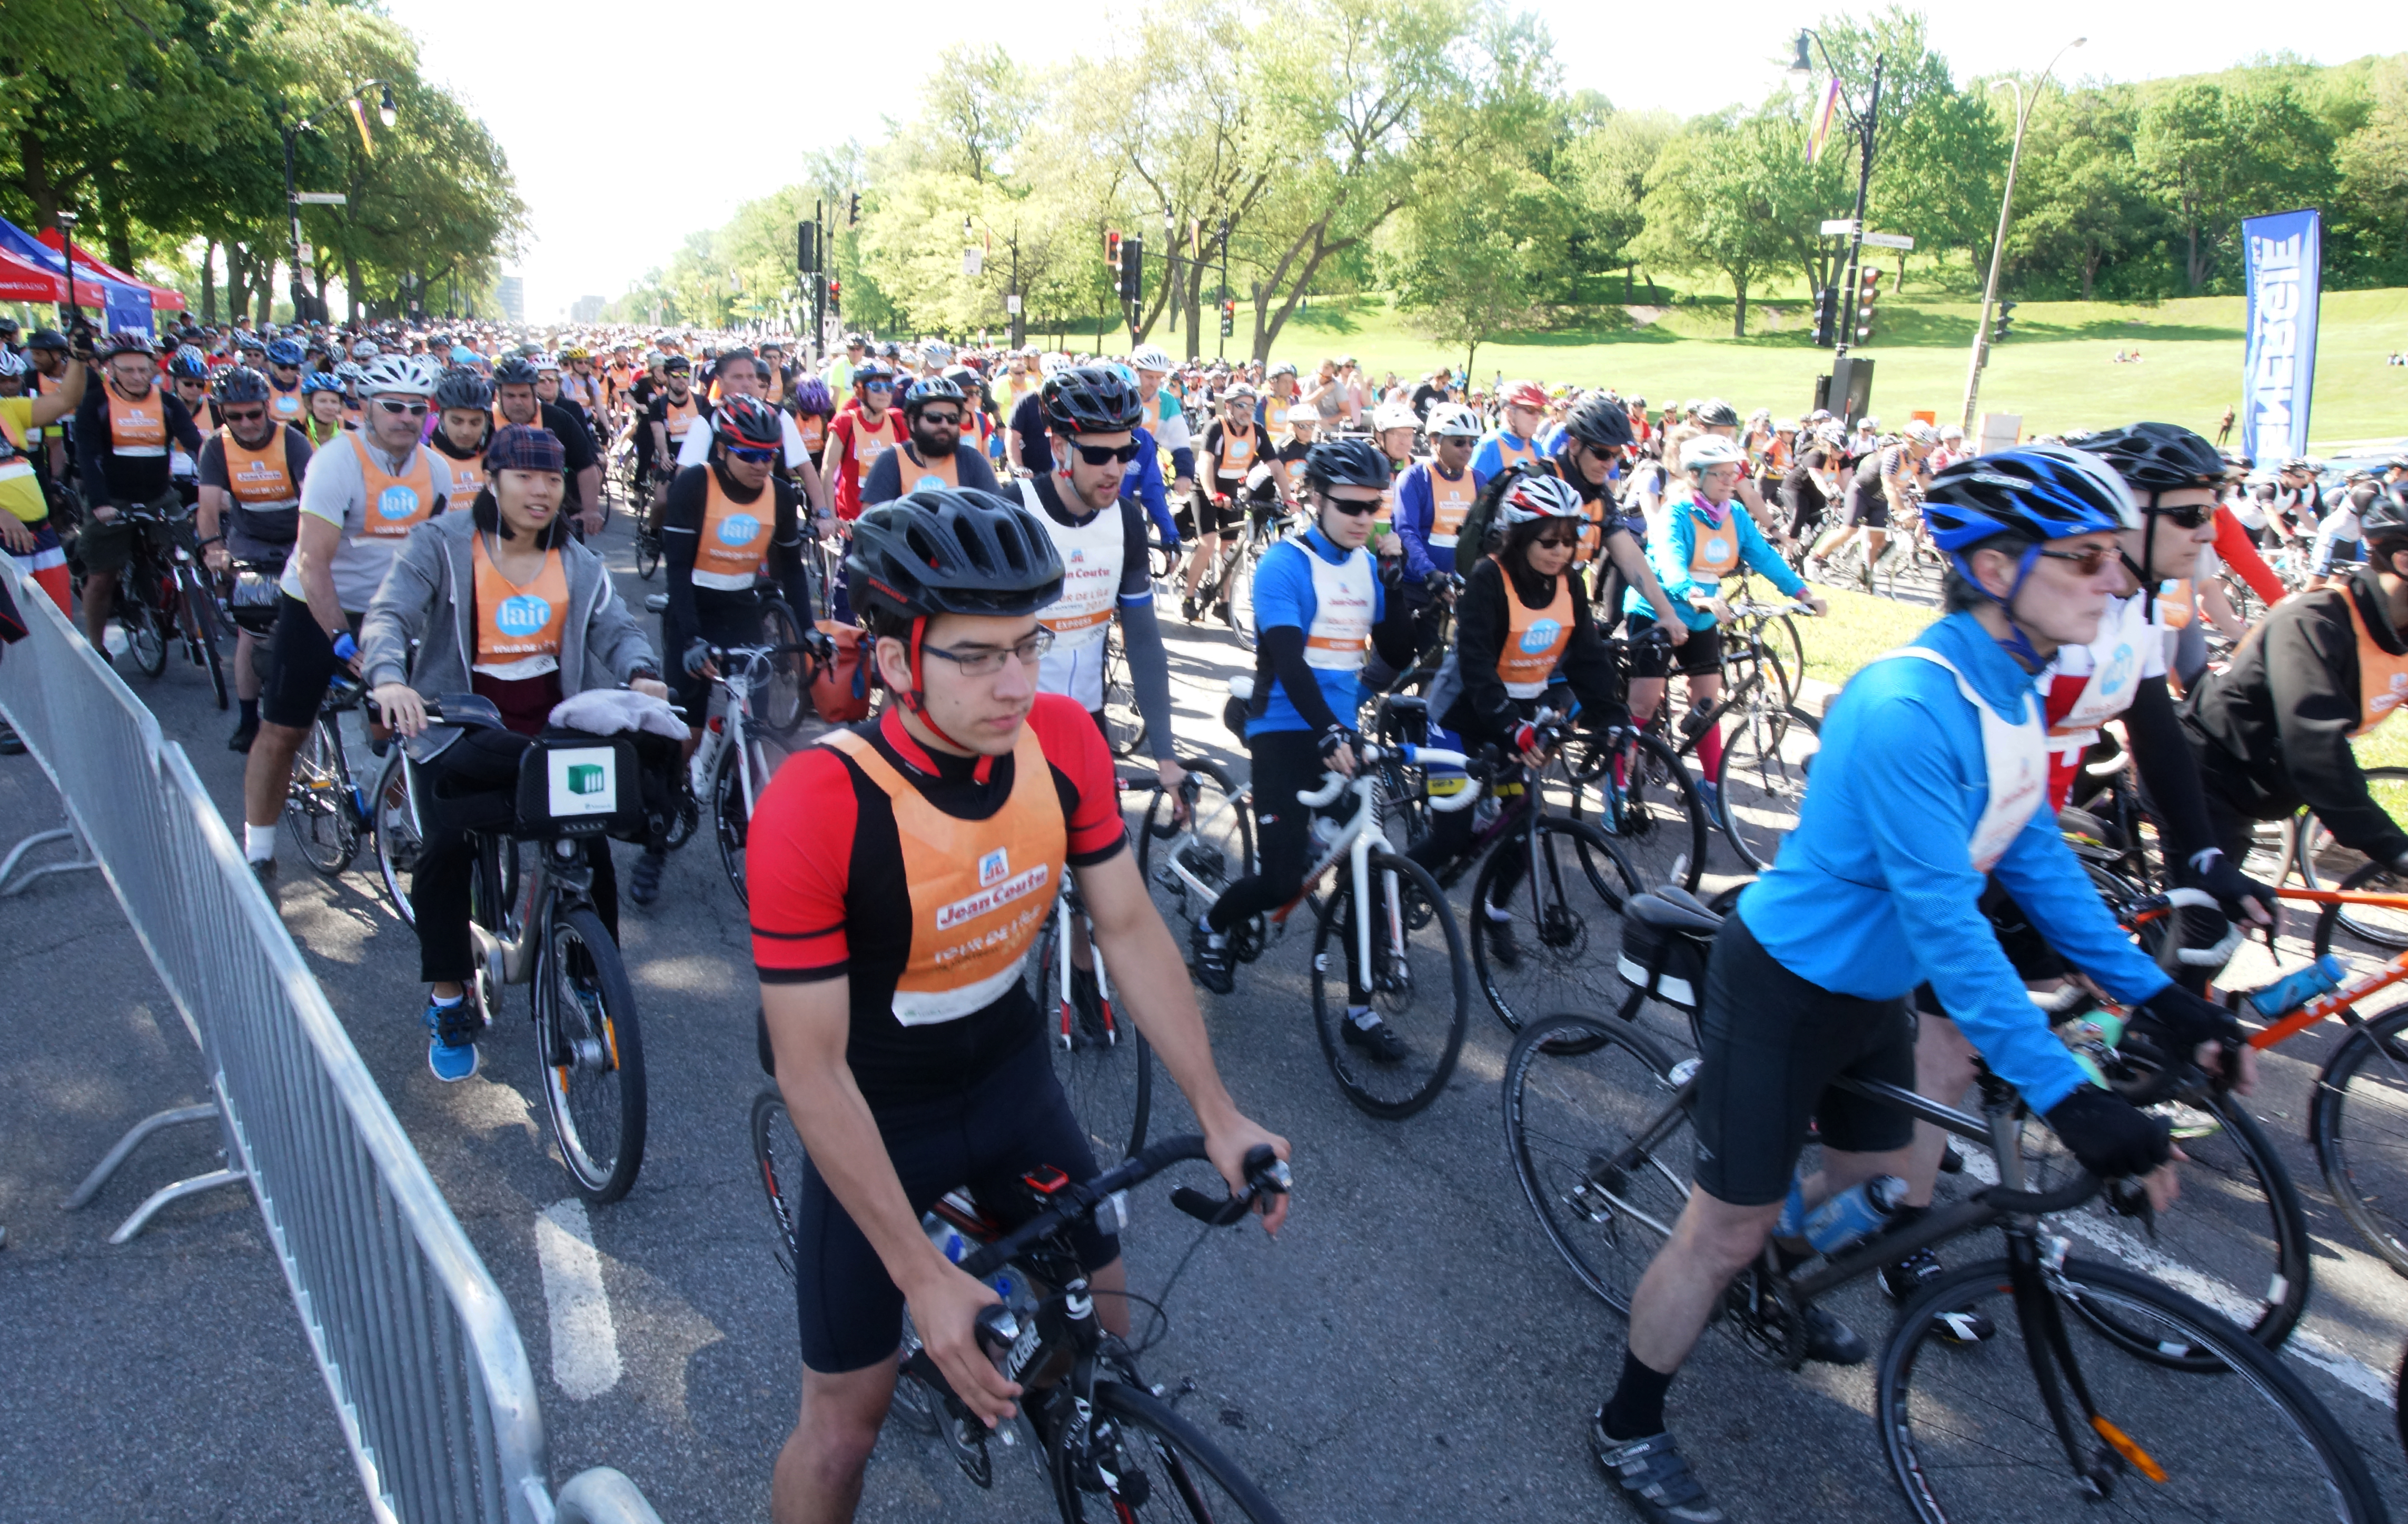 Garçons /& Filles Blanc Couche De Base Cyclisme Sports Shorts Âge 6 7 8 9 10 11 12 13 Neuf